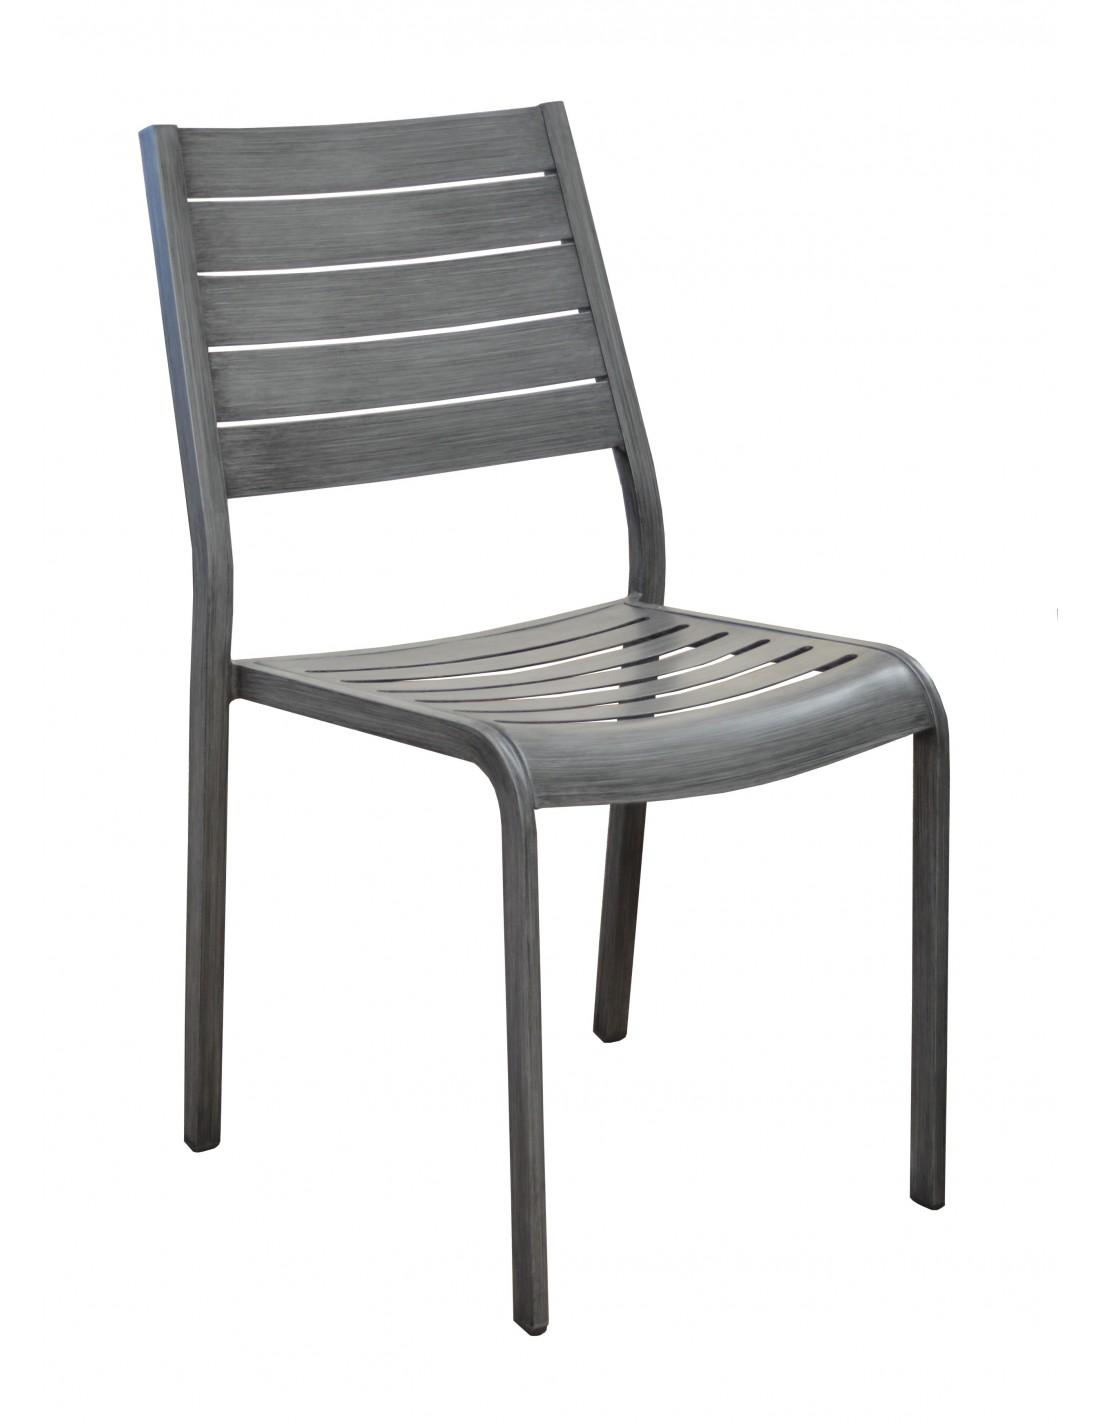 Chaise de jardin flower en aluminium brush ice ou brun proloisirs - Chaise de jardin aluminium ...